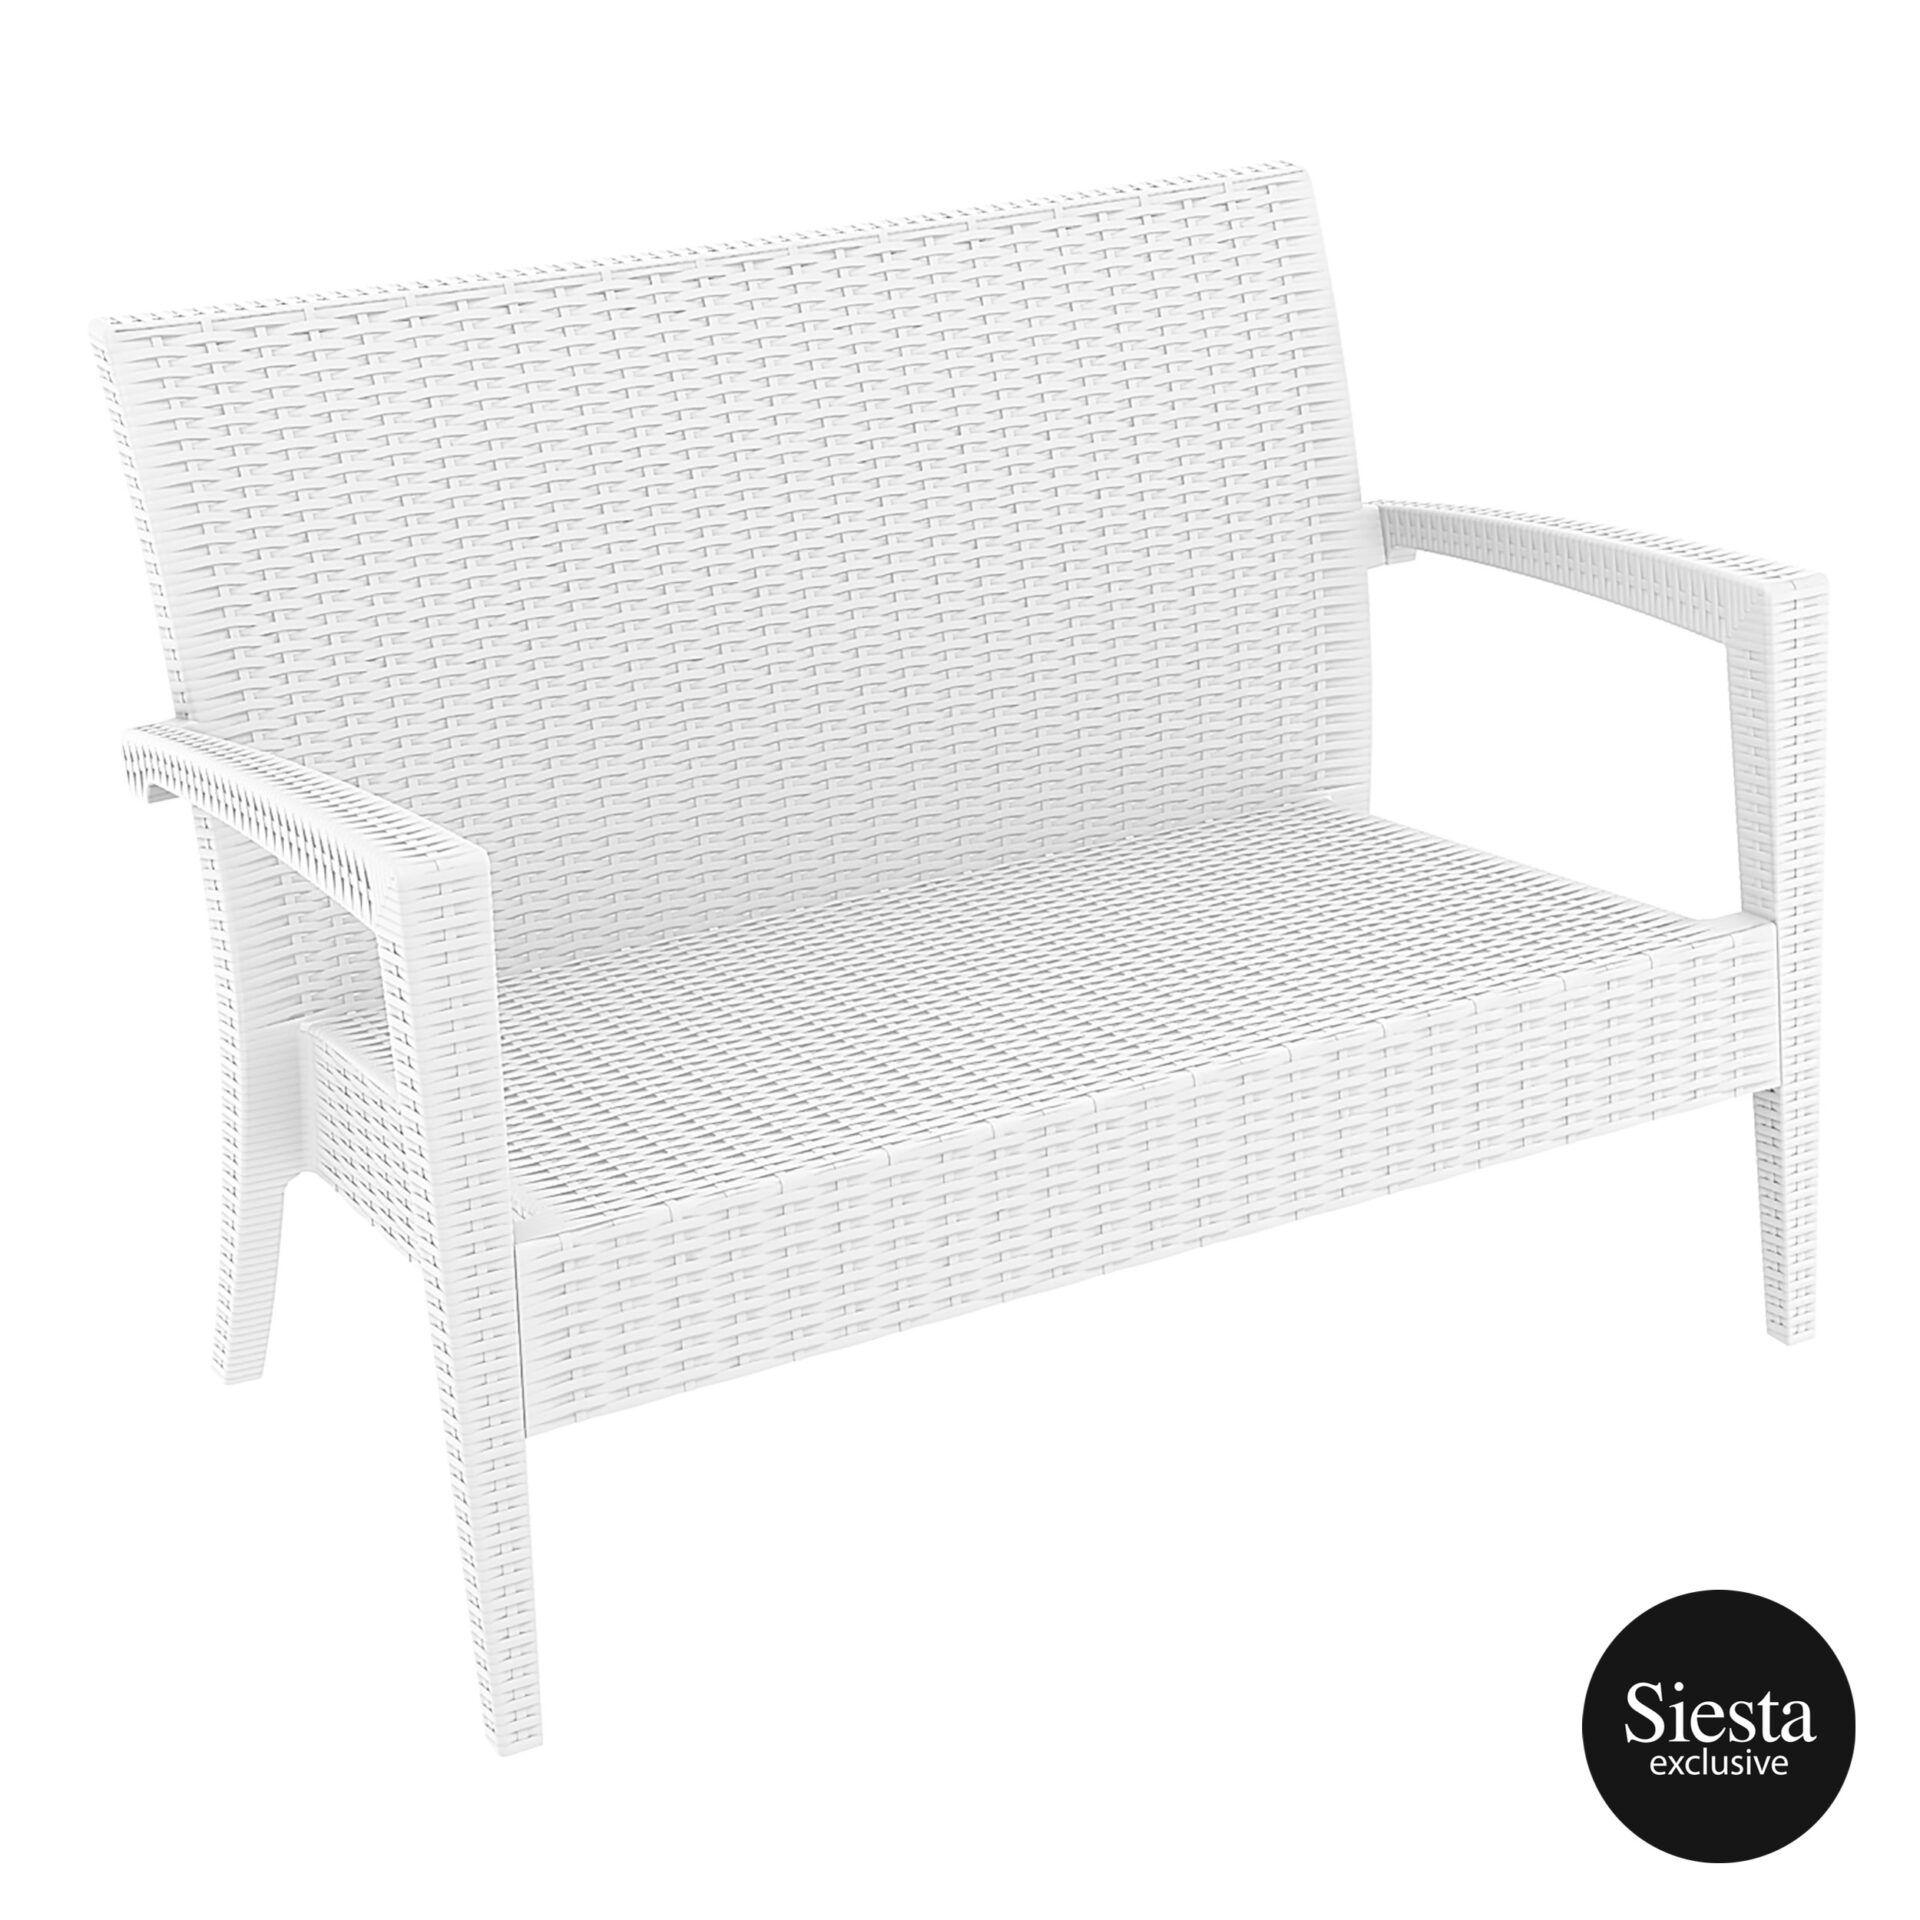 Resin Rattan Miami Tequila Lounge sofa white front side